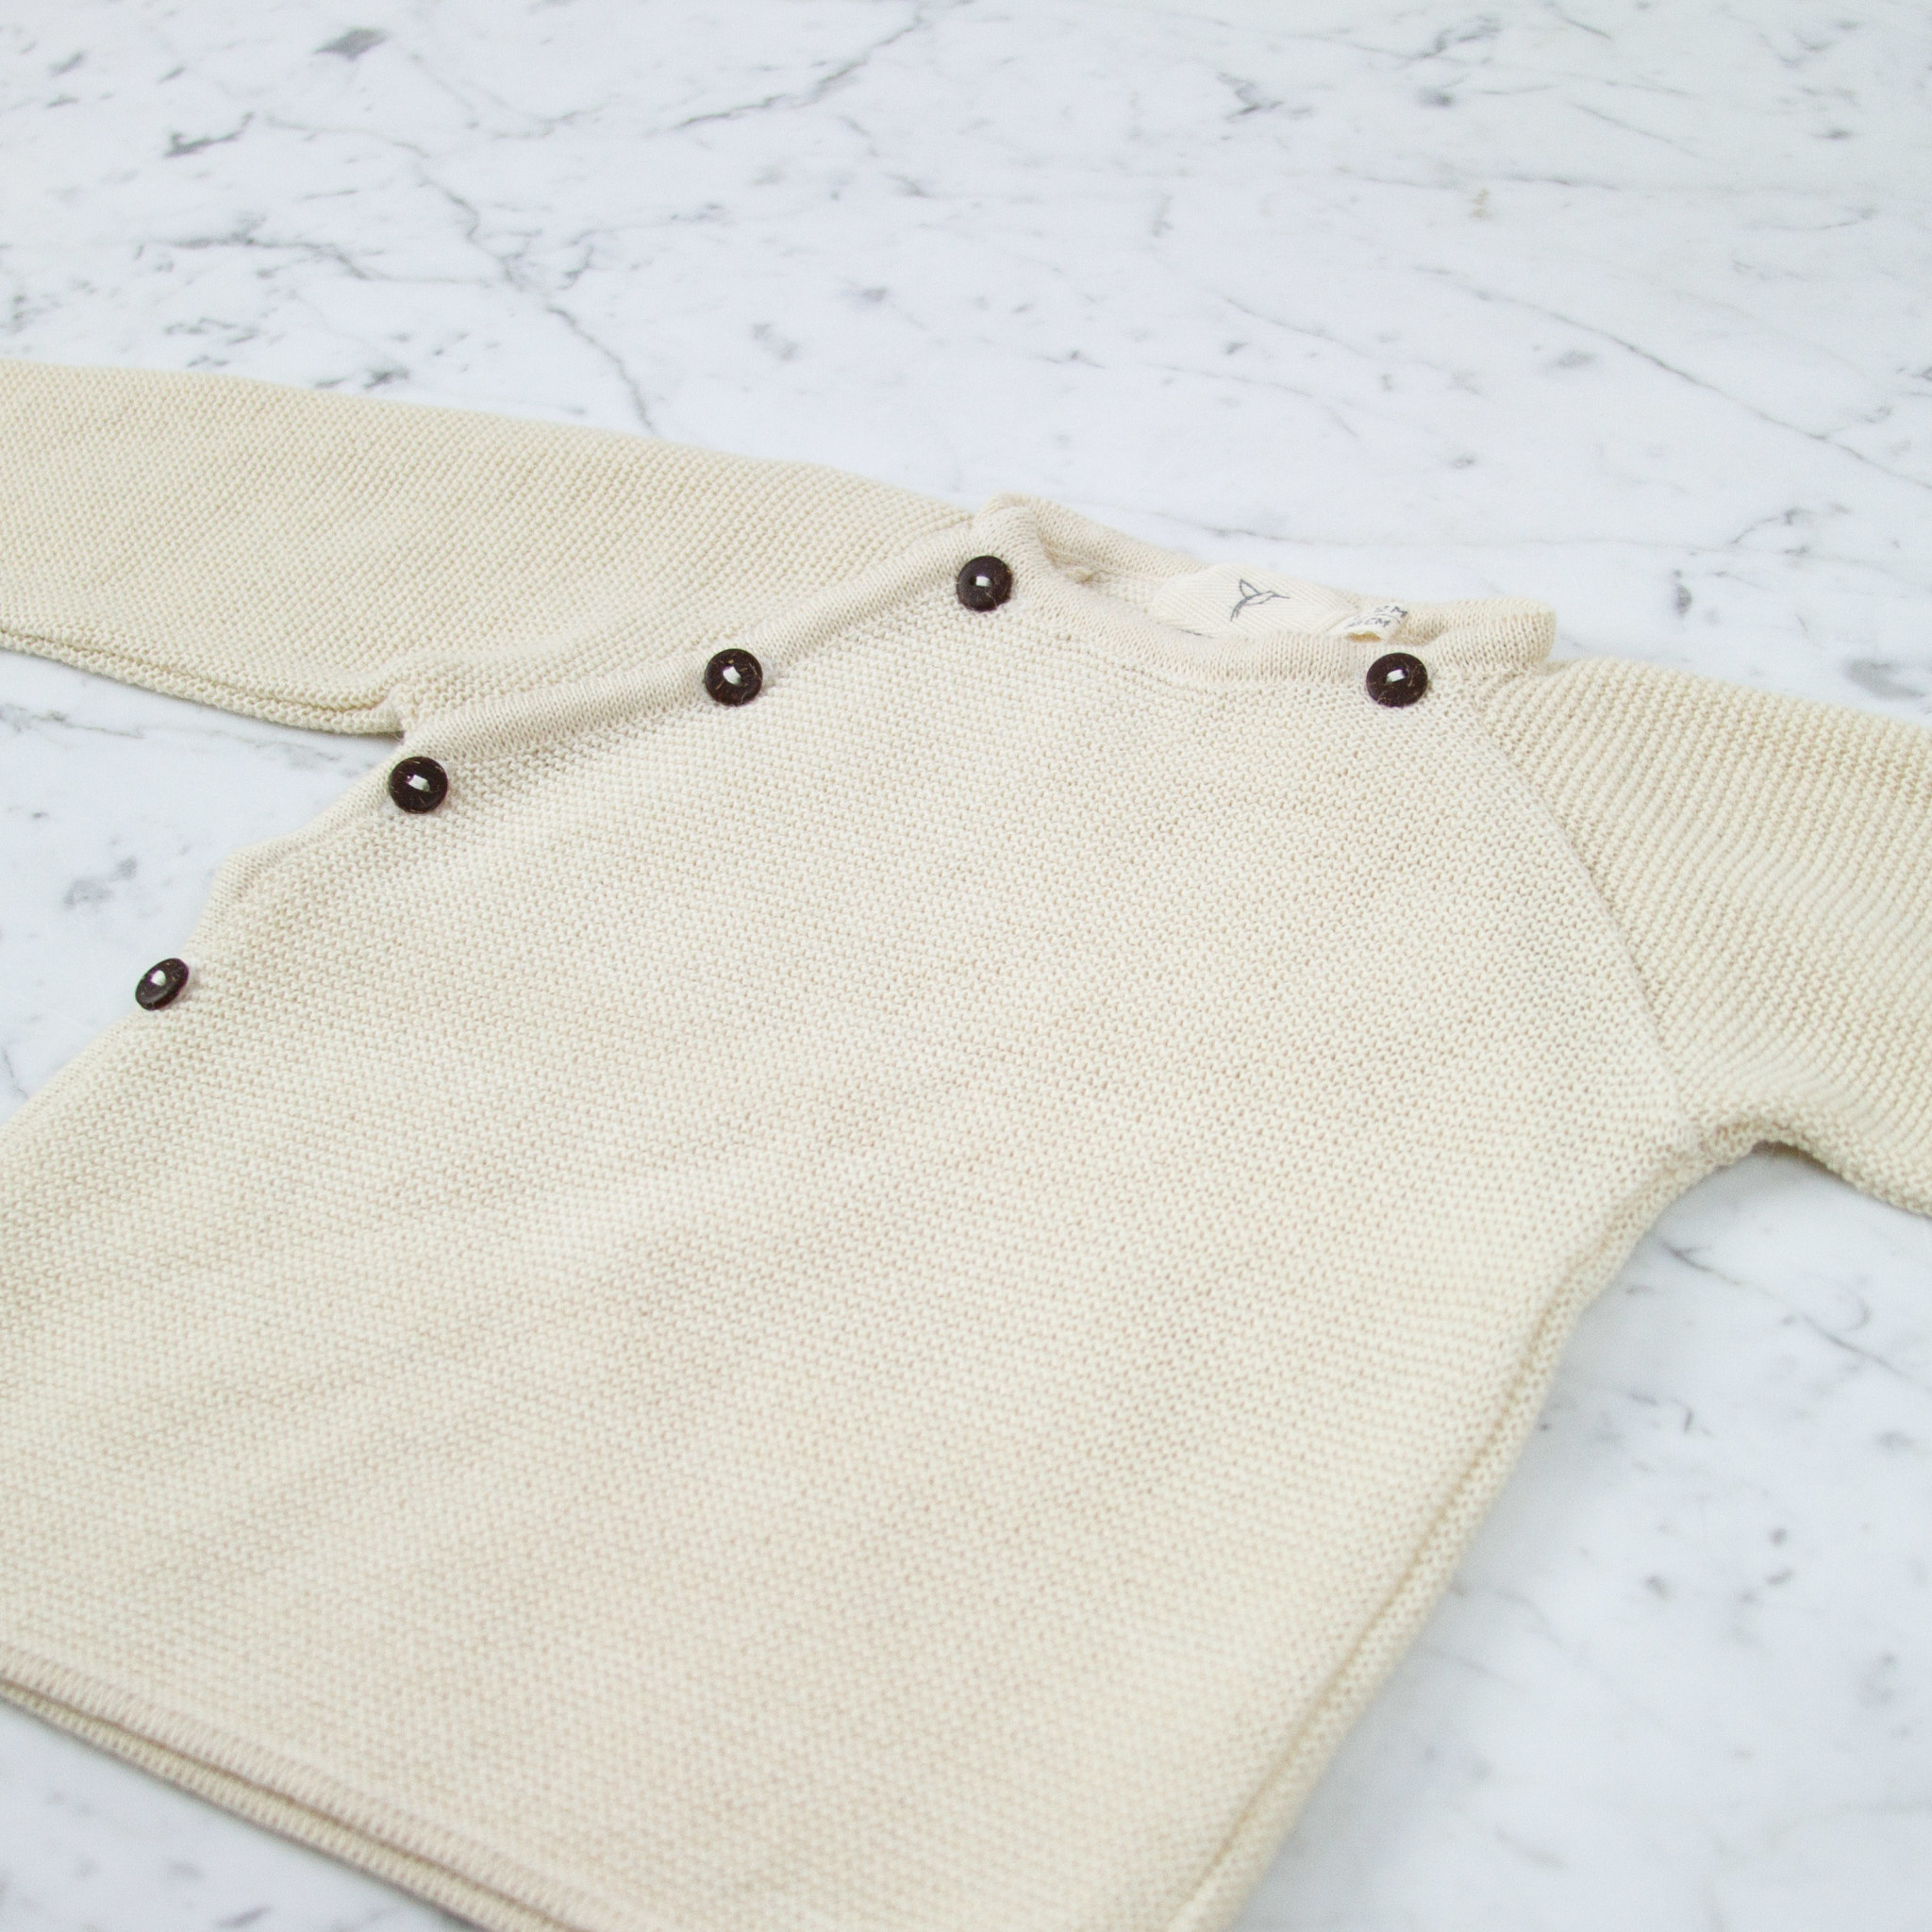 Petit Kolibri Alpaca + Cotton Knit Jacket Sweater - Beige Cream - 6-12 Month